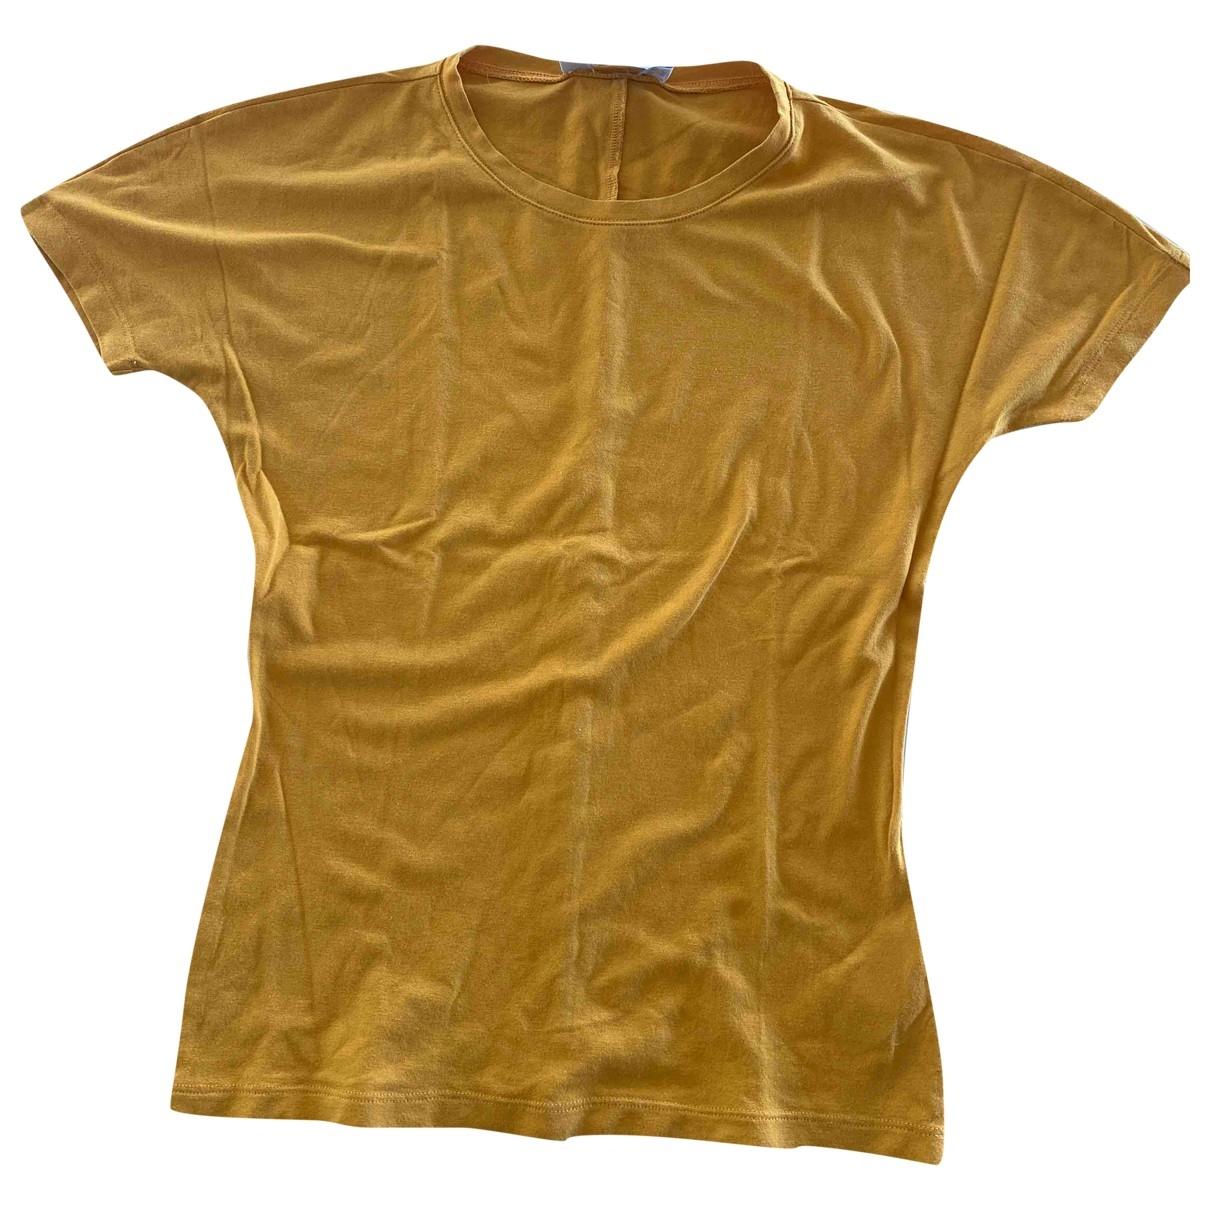 Max Mara \N Yellow Cotton  top for Women S International